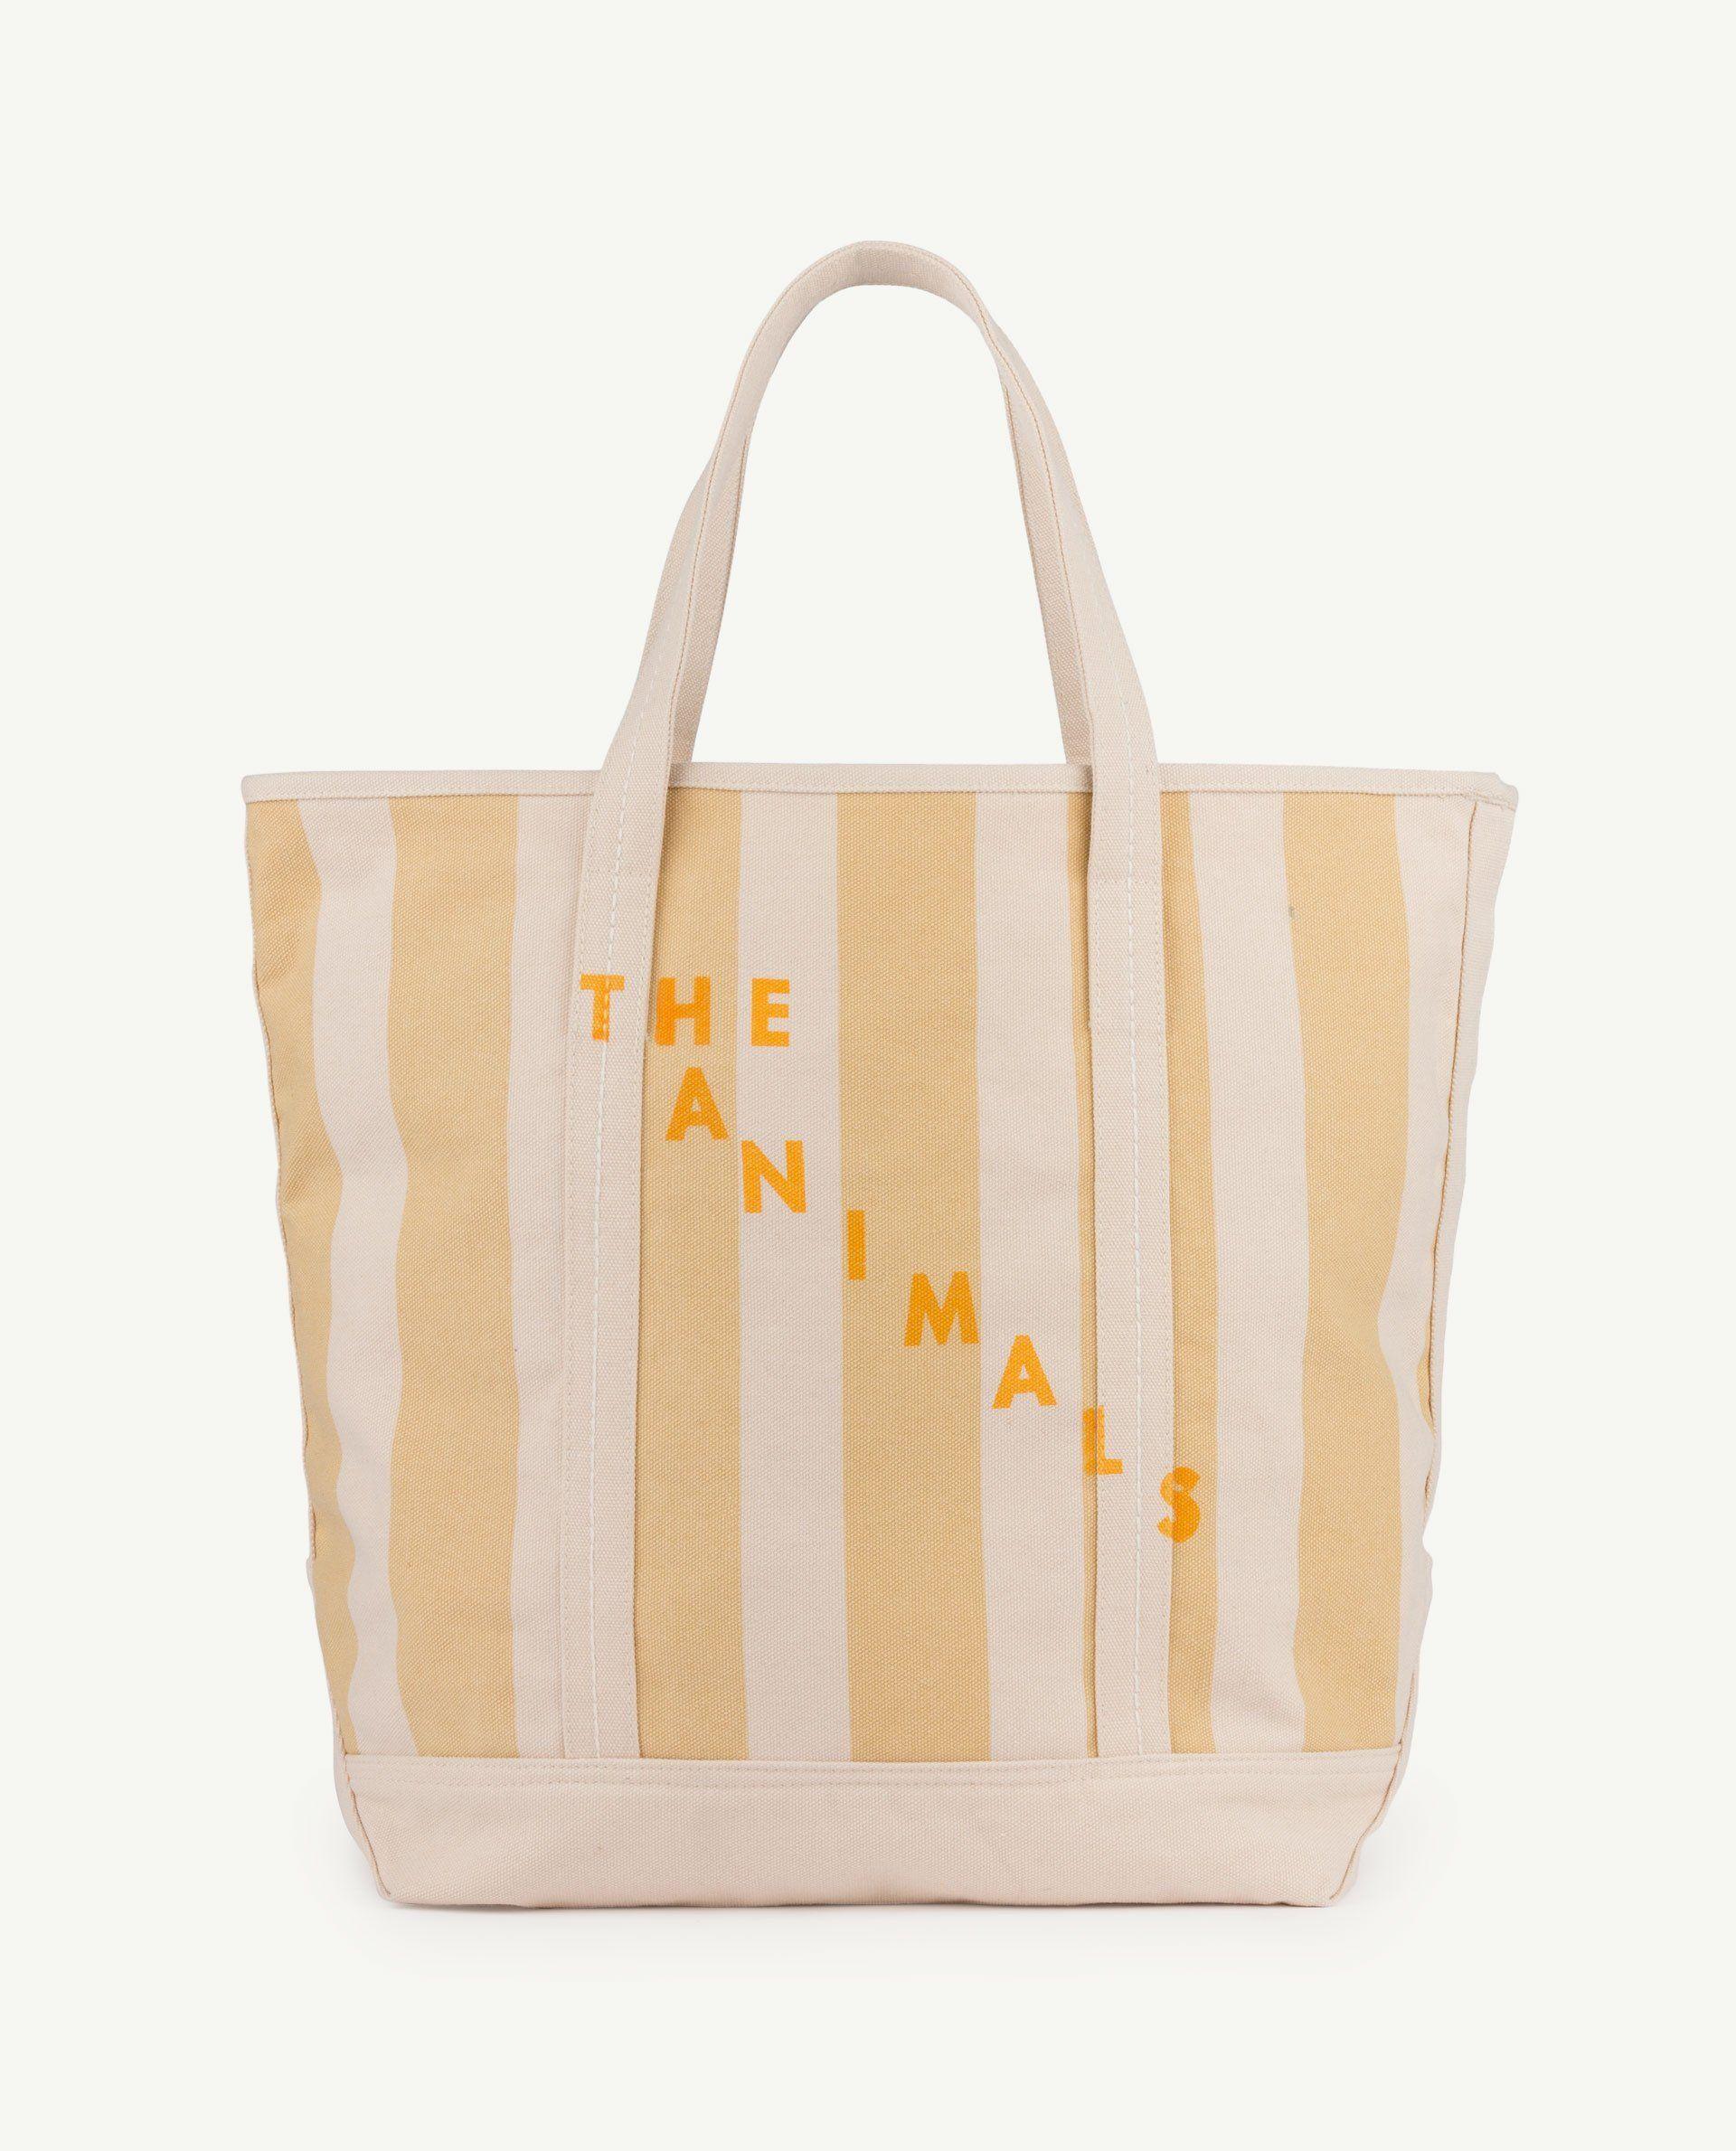 Canvas Tote Bag Tote bag, Canvas tote bags, Bags